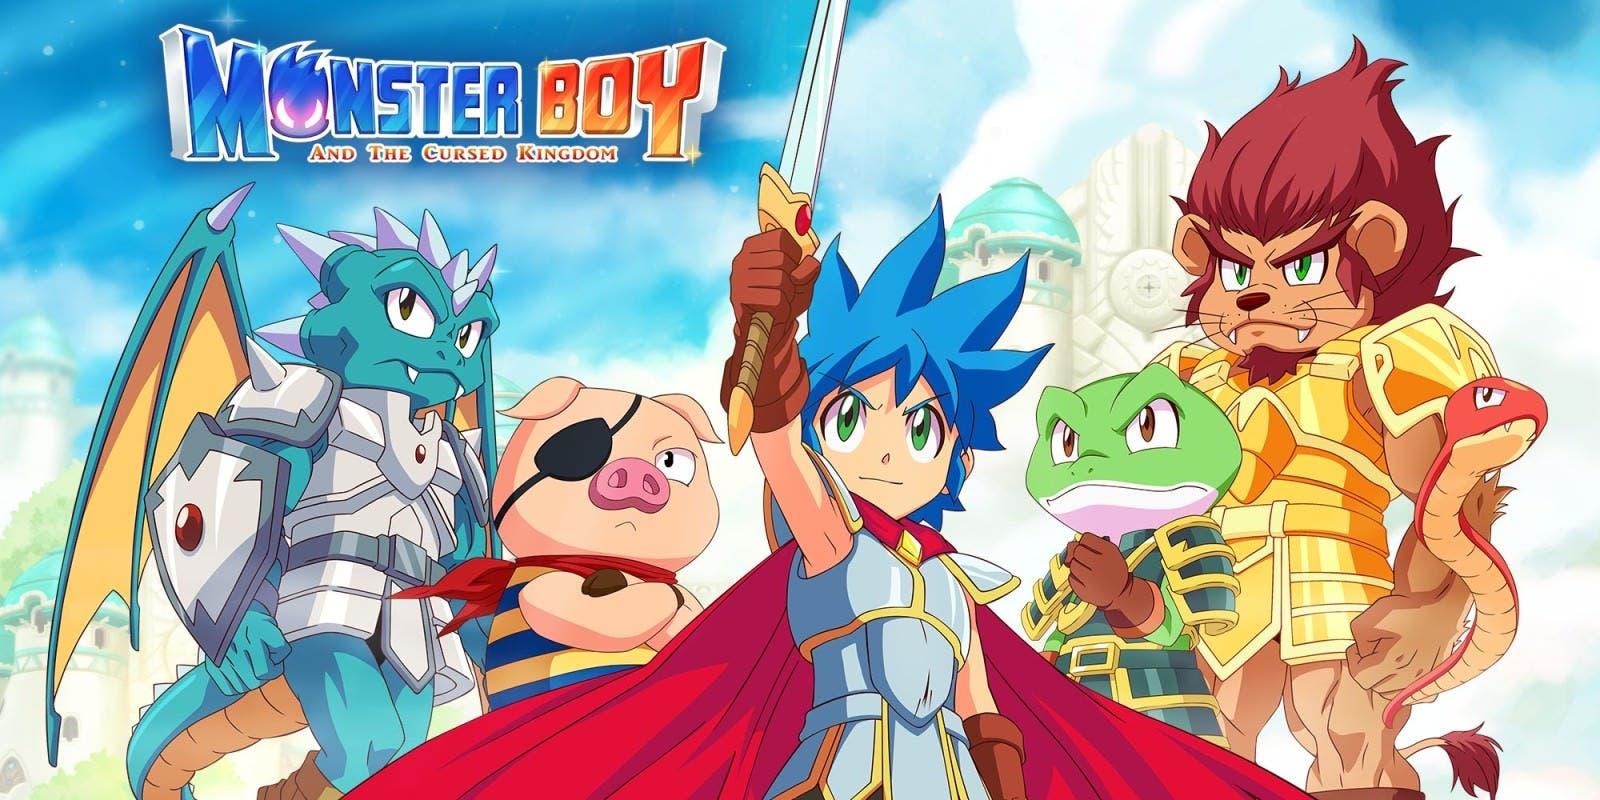 FDG Entertainment comparte nuevos detalles de Monster Boy and the Cursed Kingdom